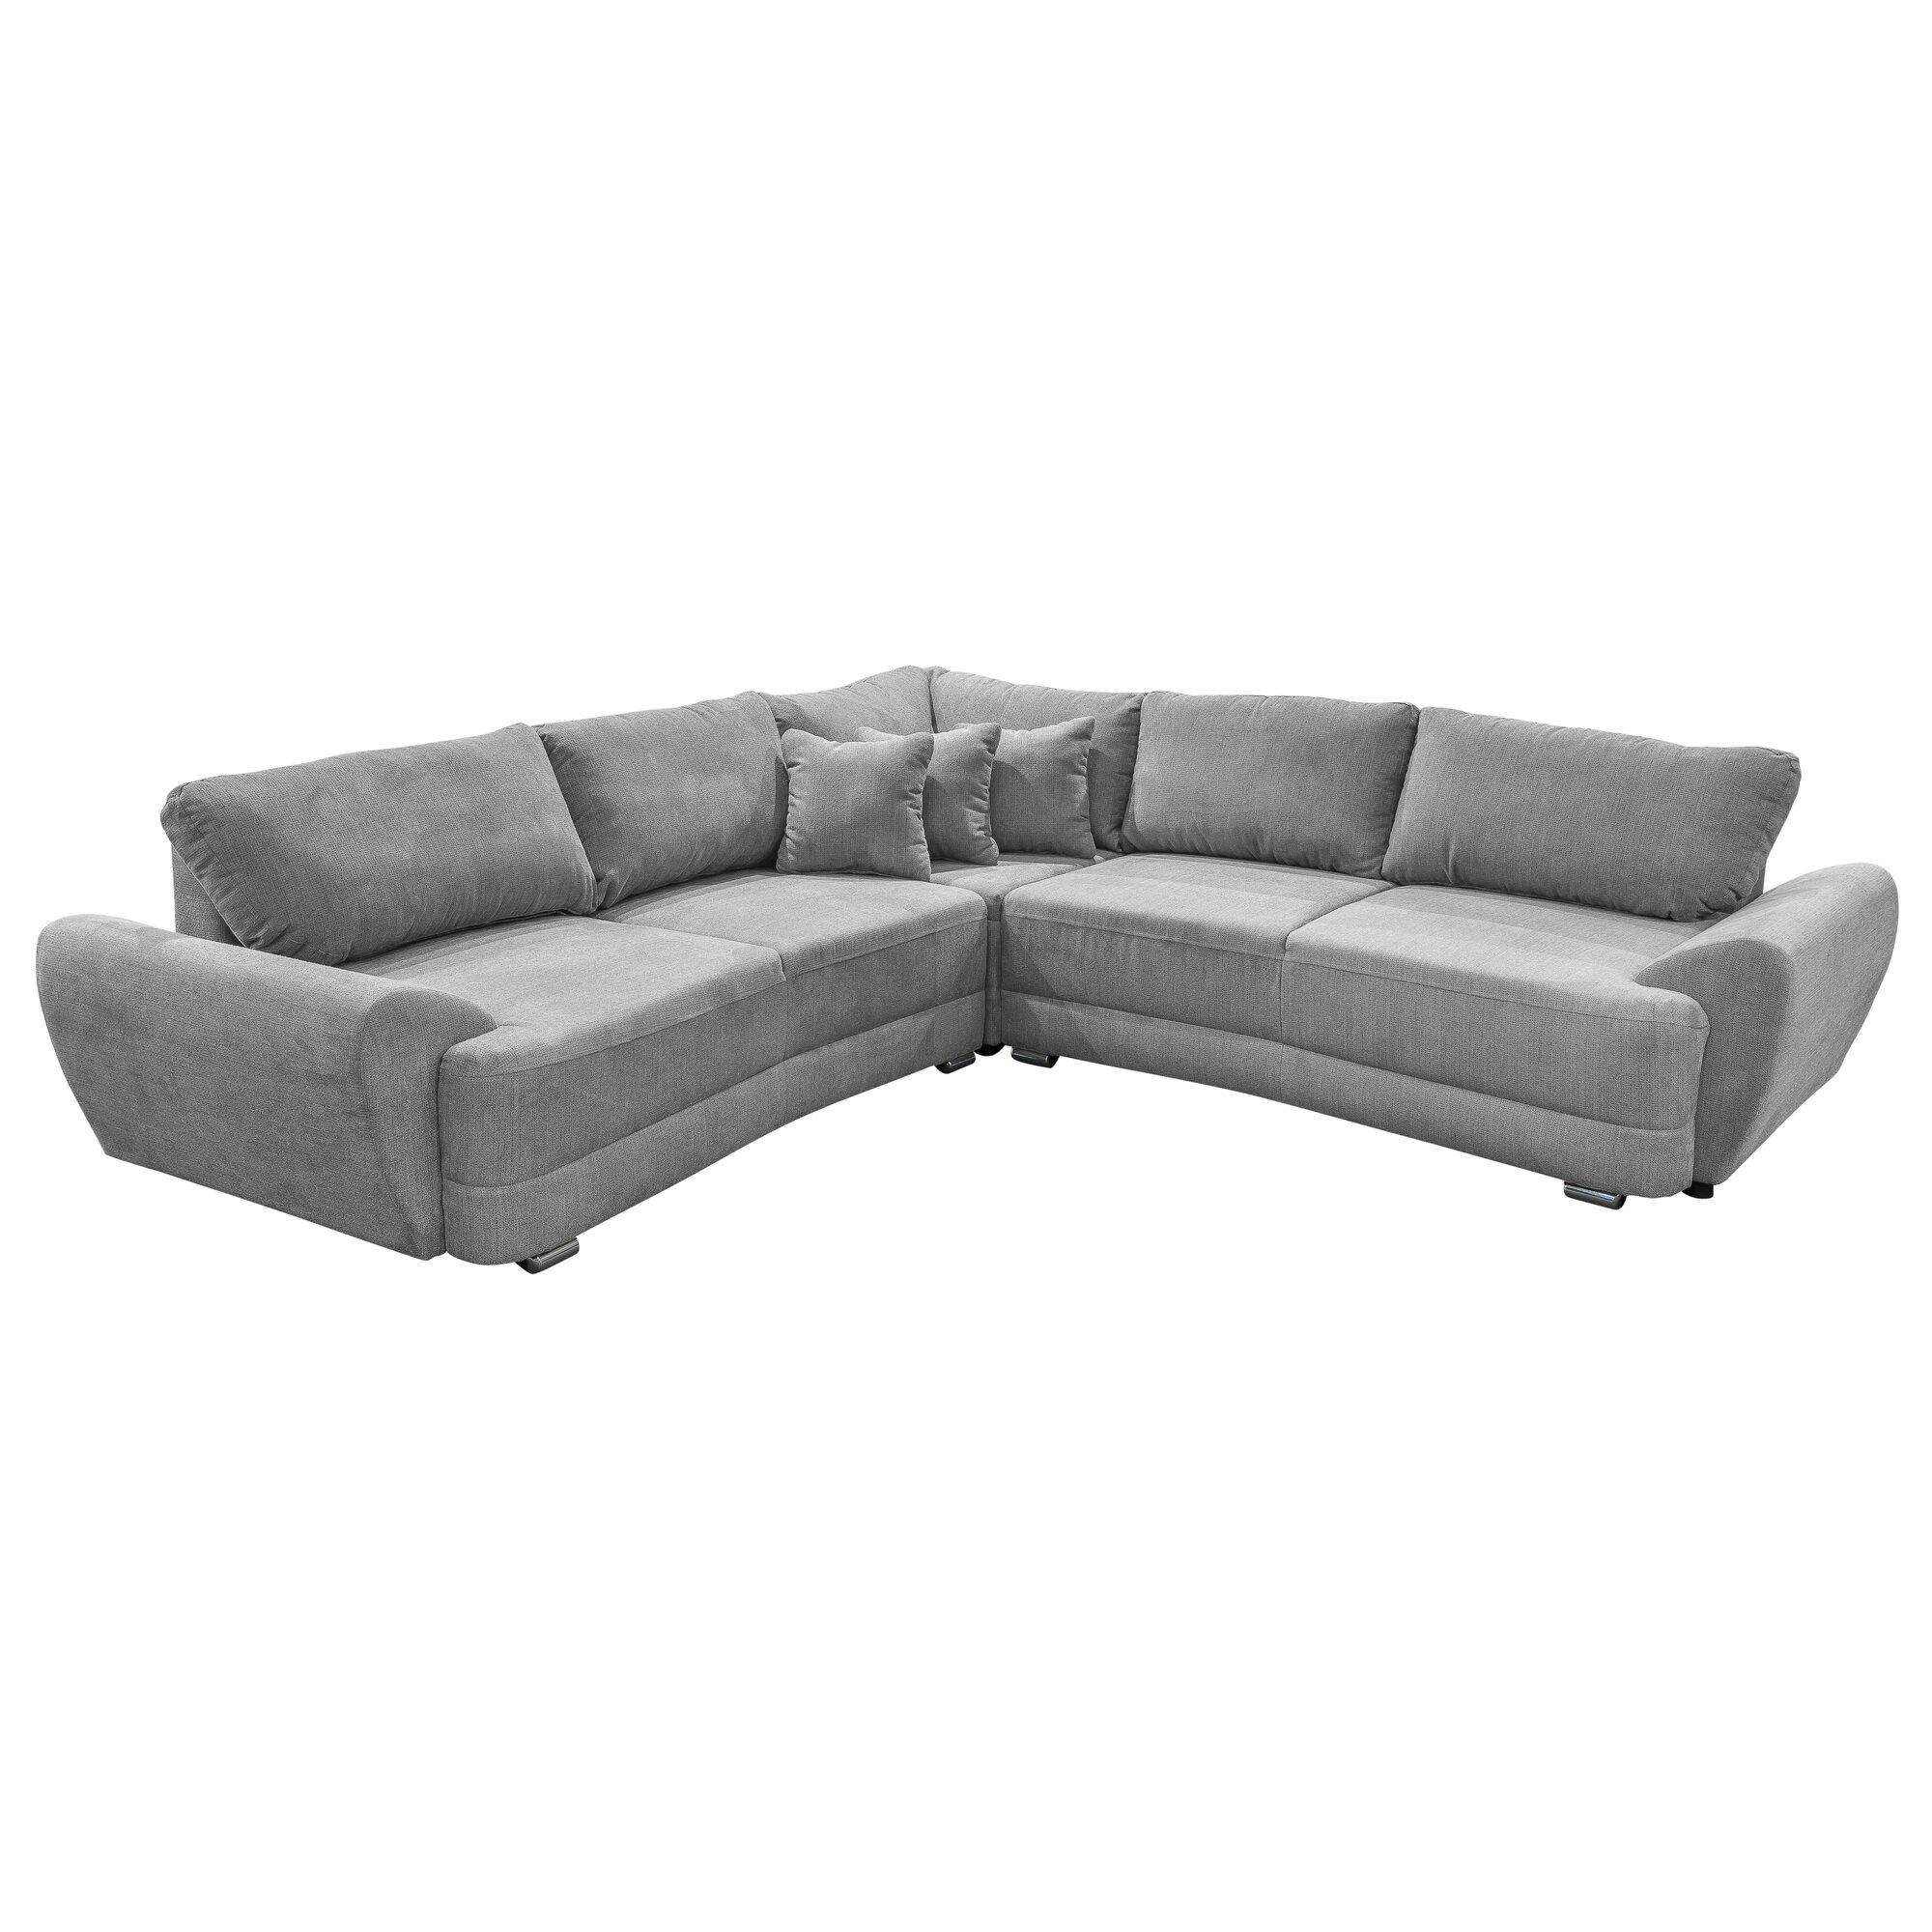 benformato 6 sitzer ecksofa basso mit bettfunktion. Black Bedroom Furniture Sets. Home Design Ideas